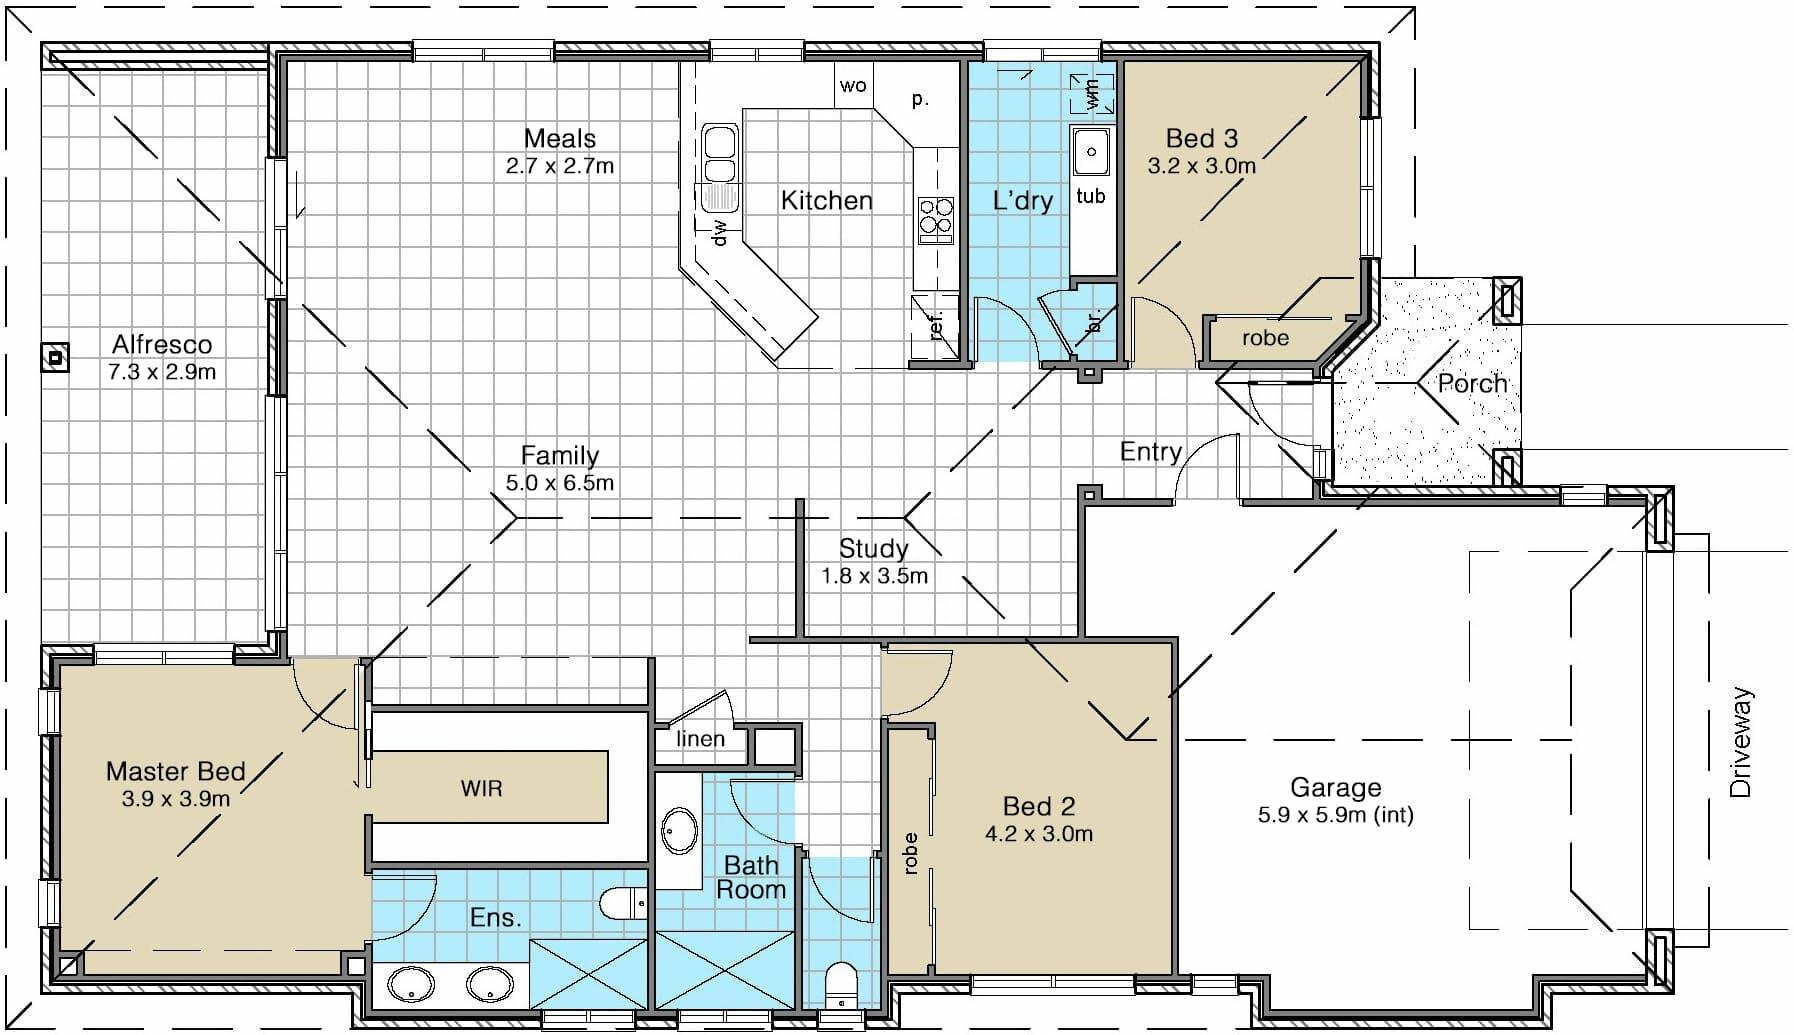 paisley-altered-floor-plan